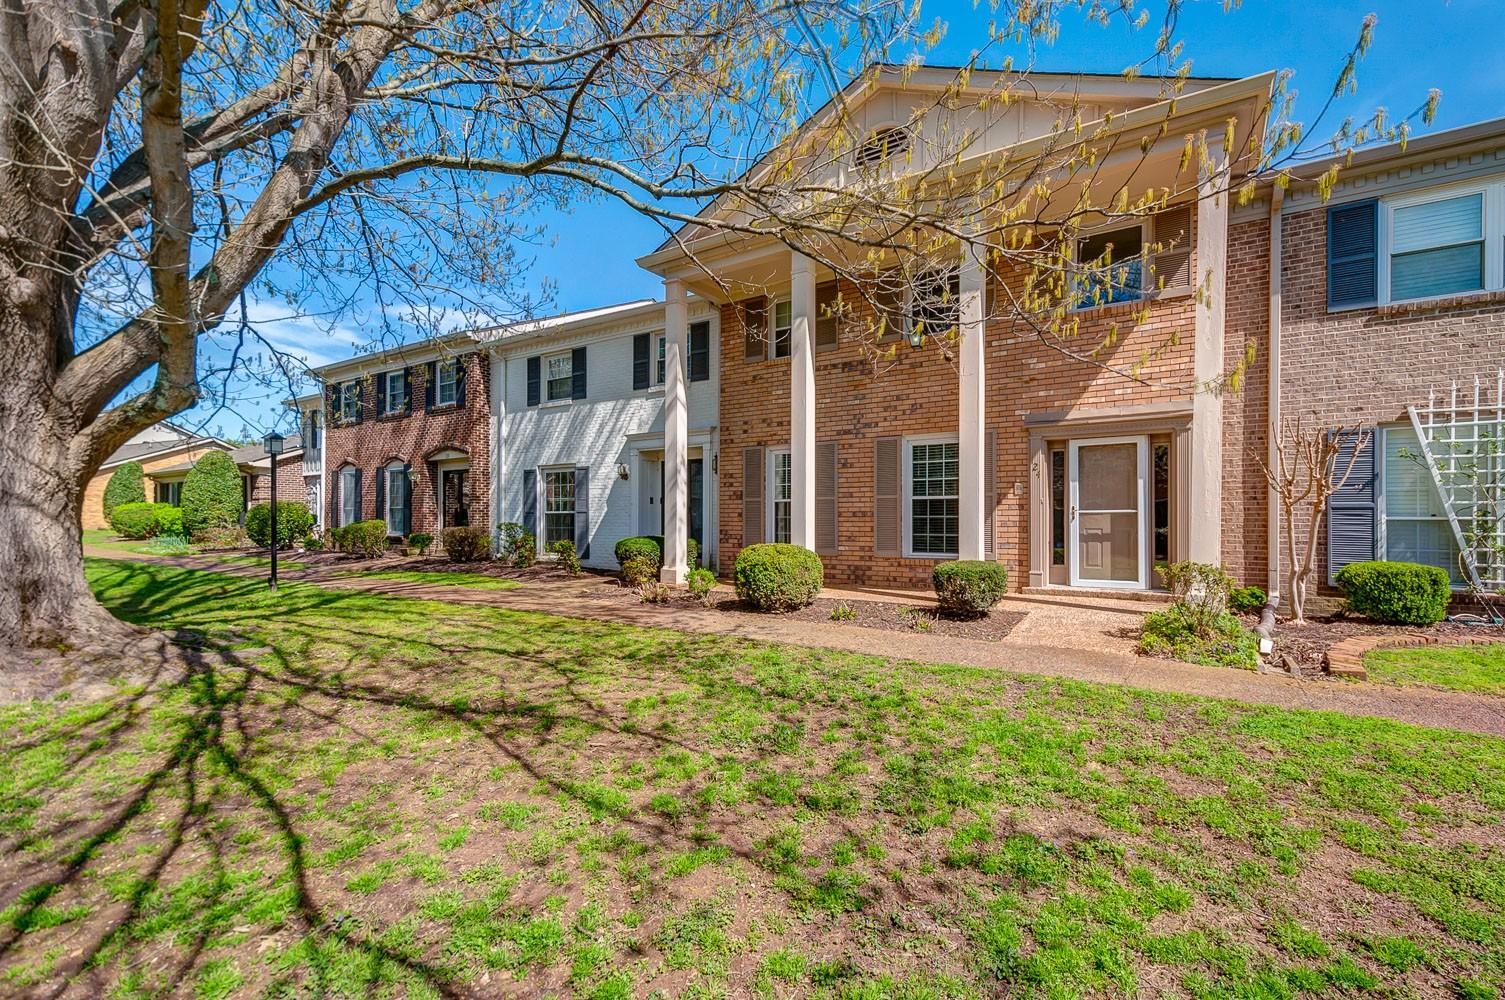 124 Plantation Ct, Nashville, TN 37221 - Nashville, TN real estate listing